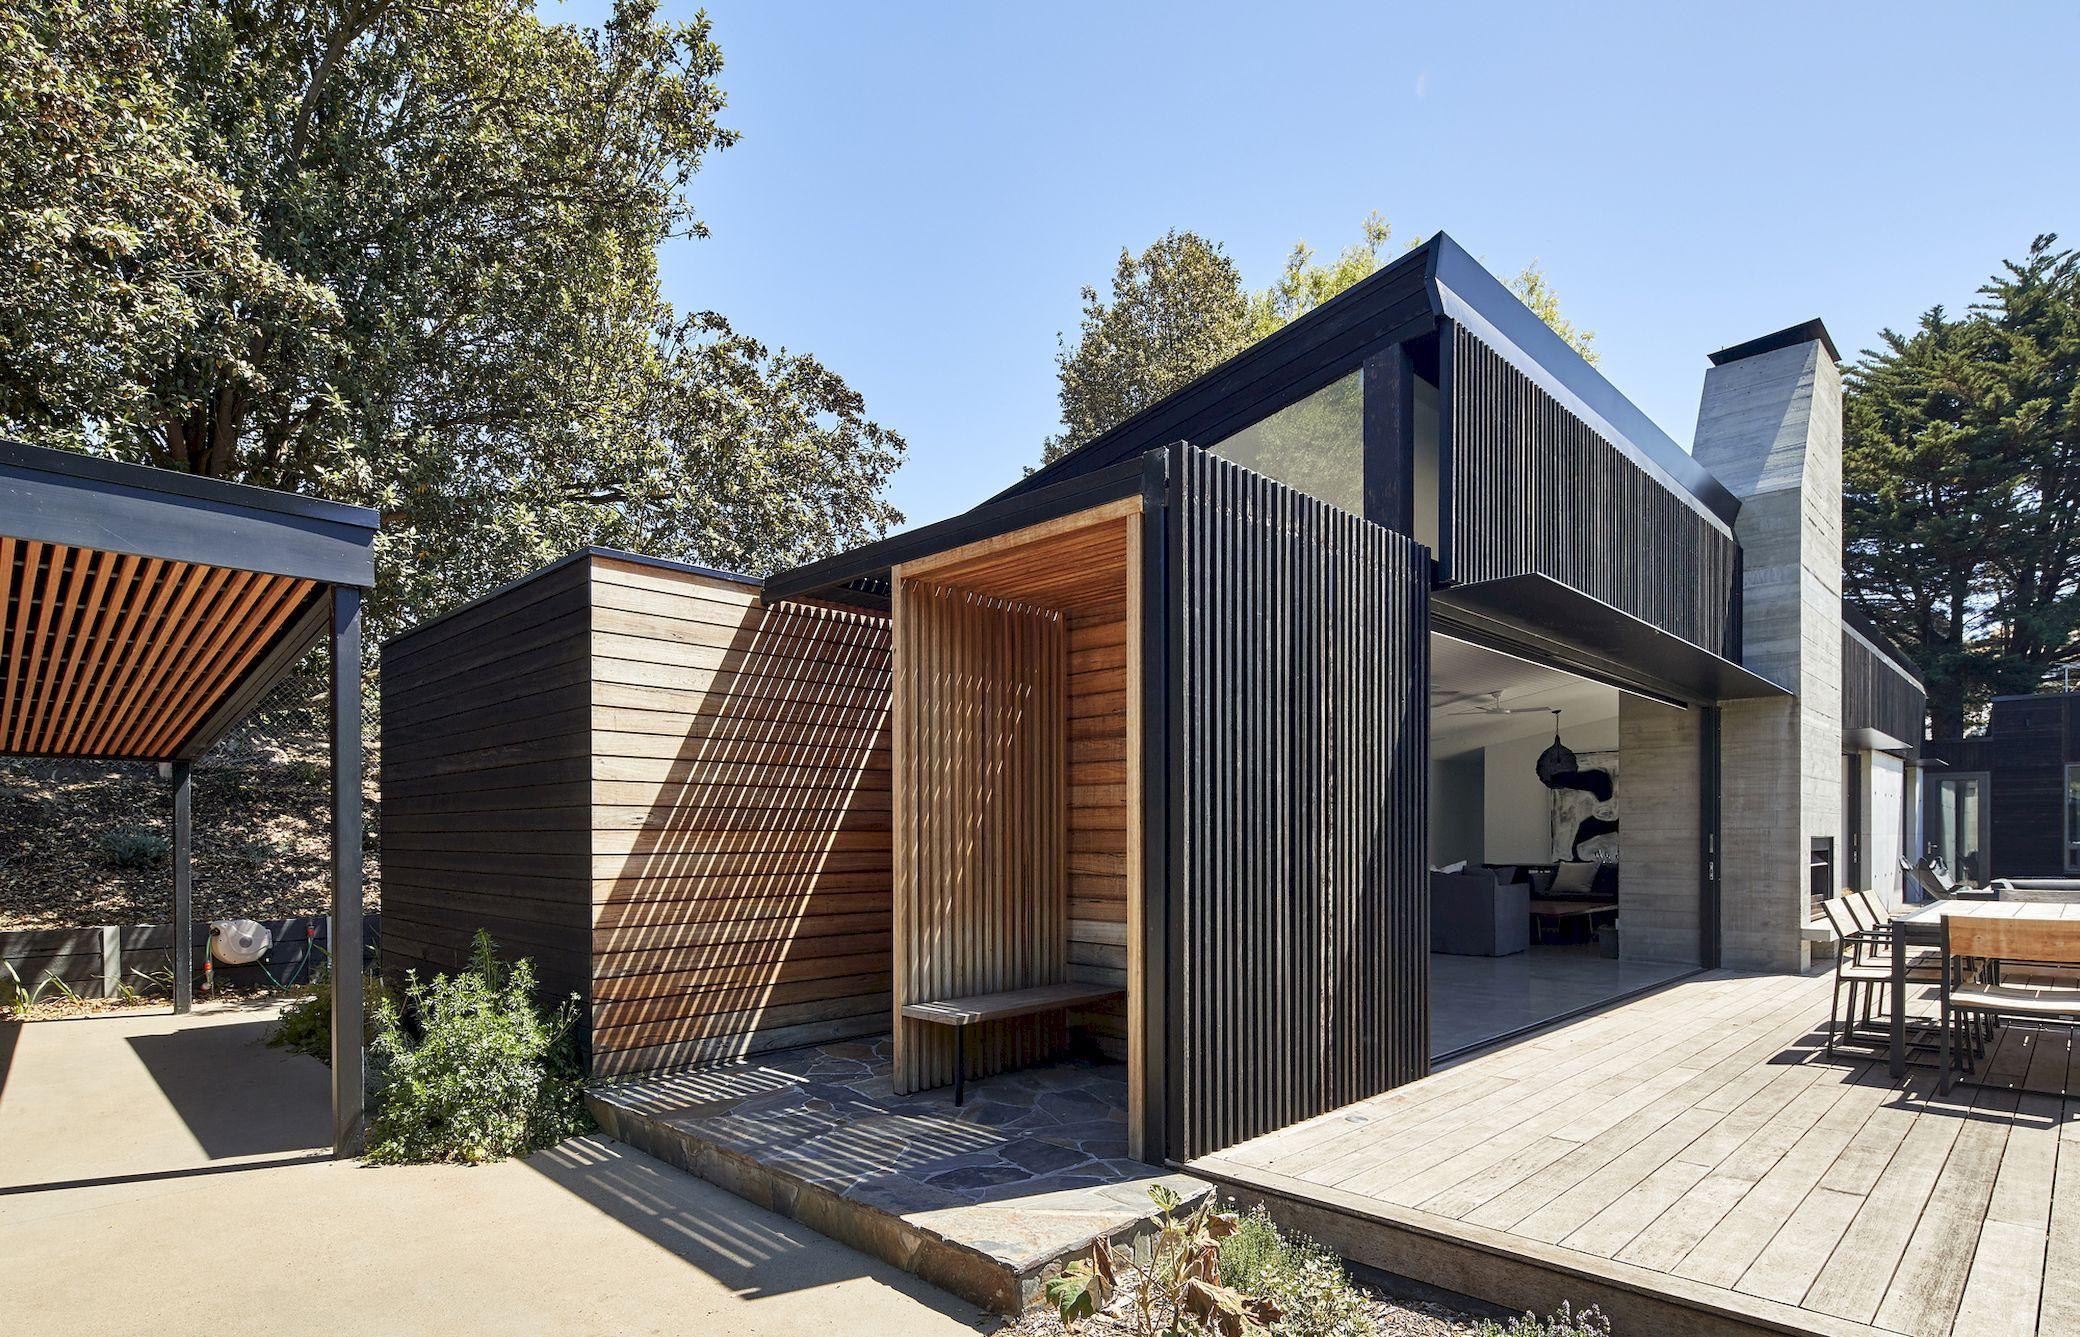 Droomhuis La House : First lessons house häuser architectuur moderne